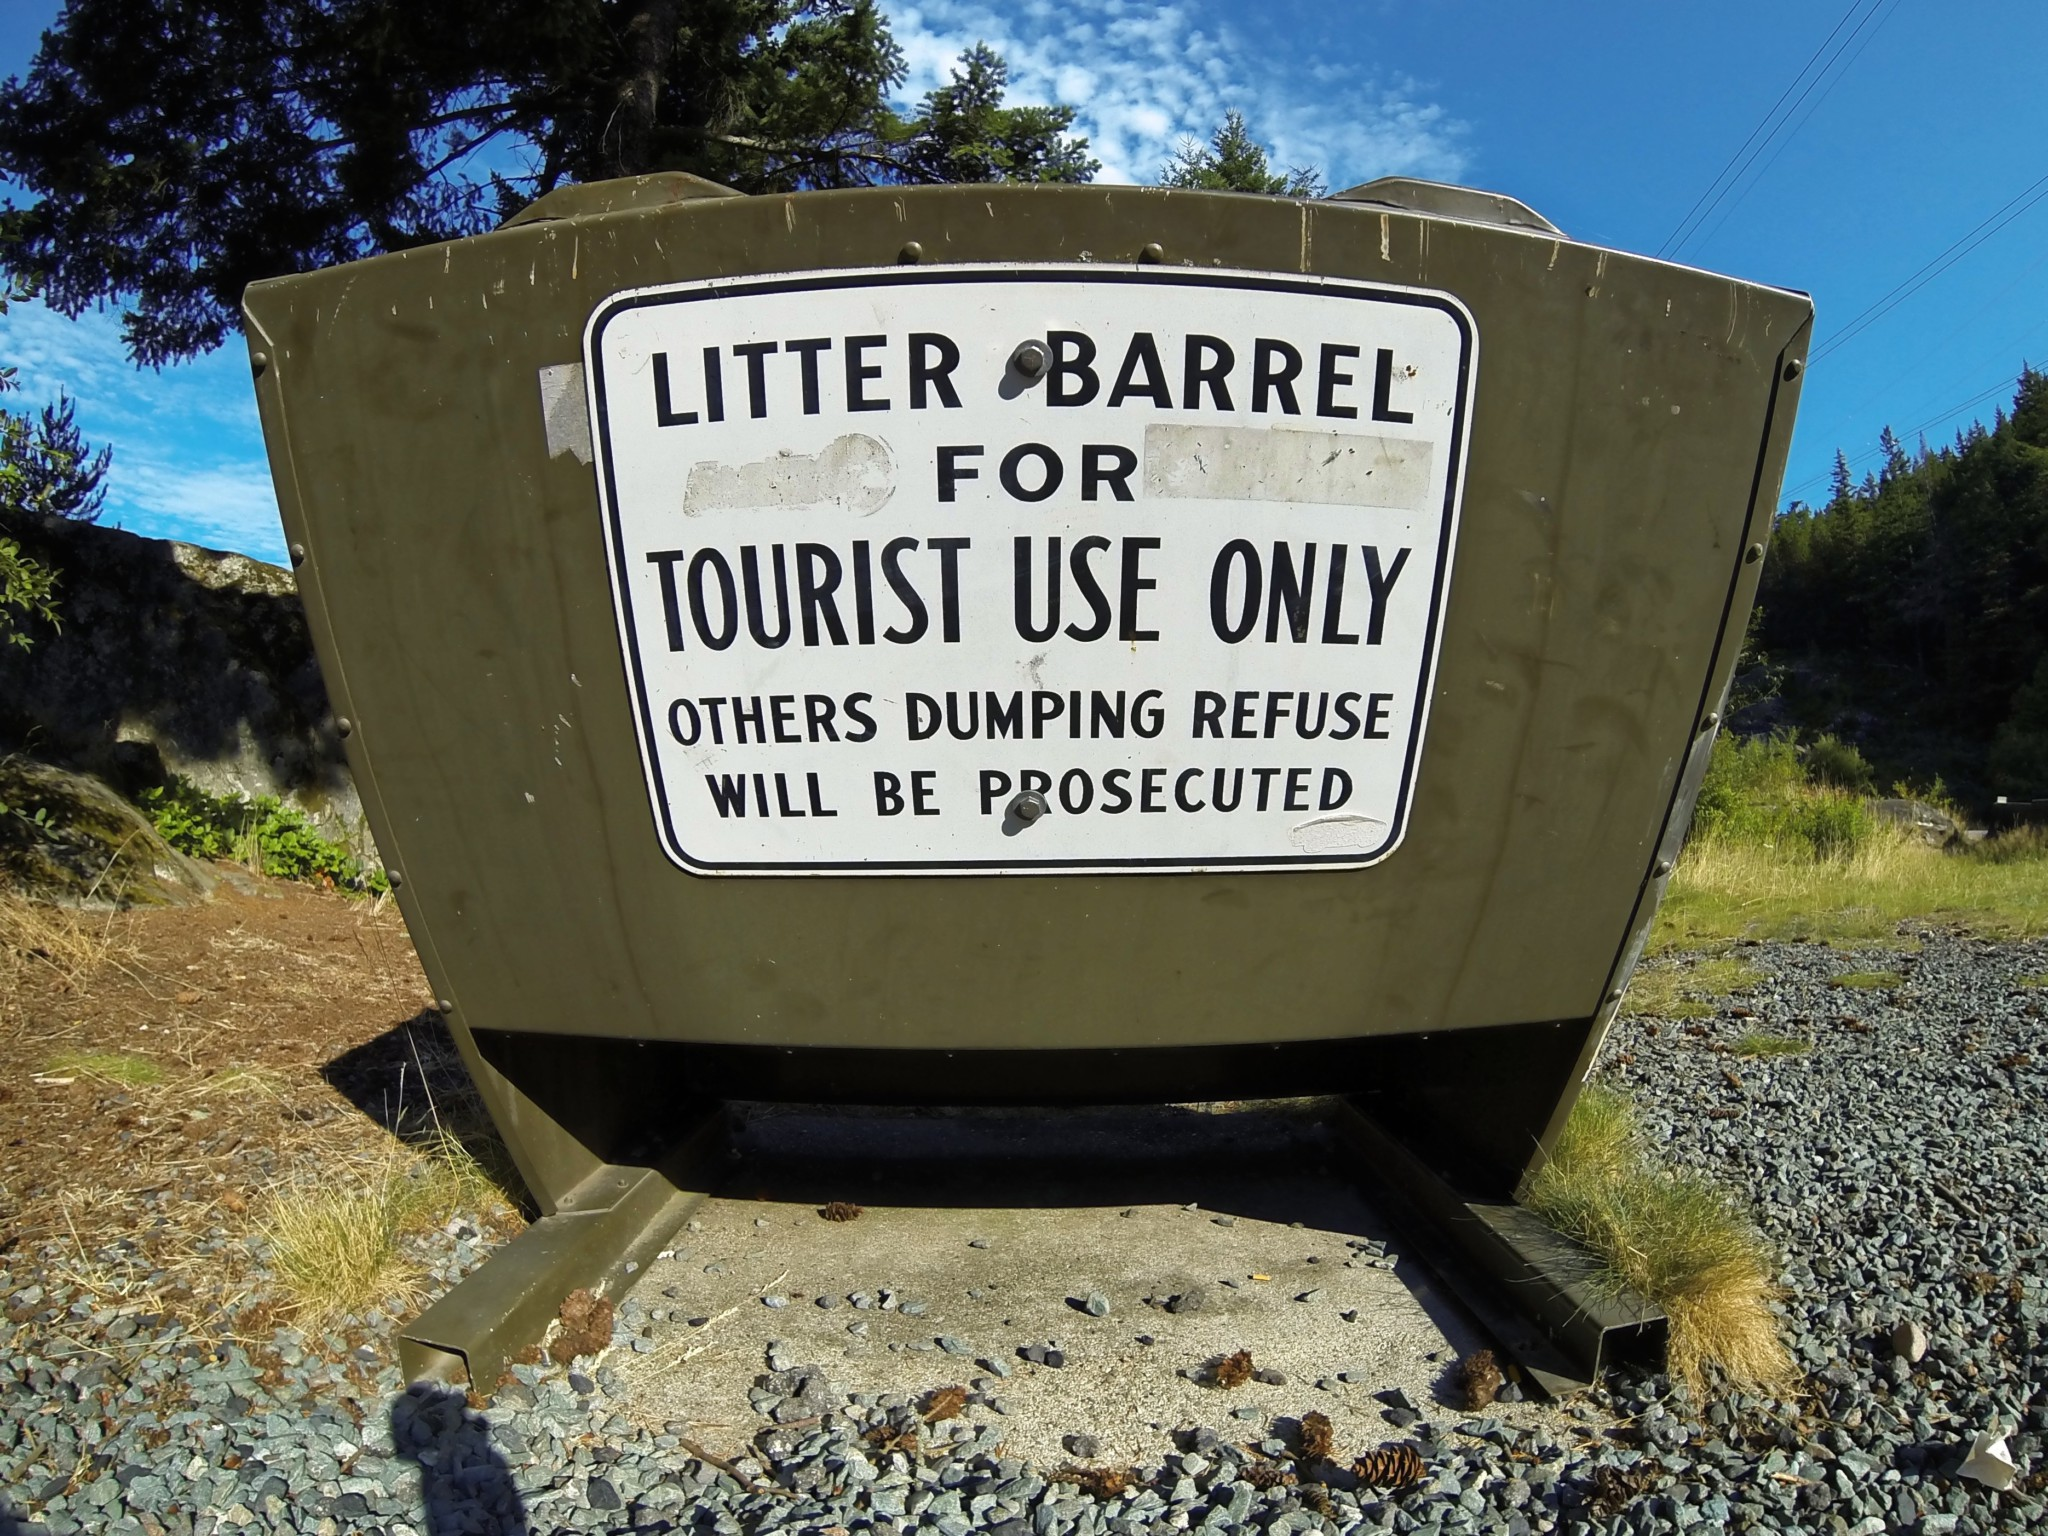 Bärensicherer Abfallbehälter in Kanada